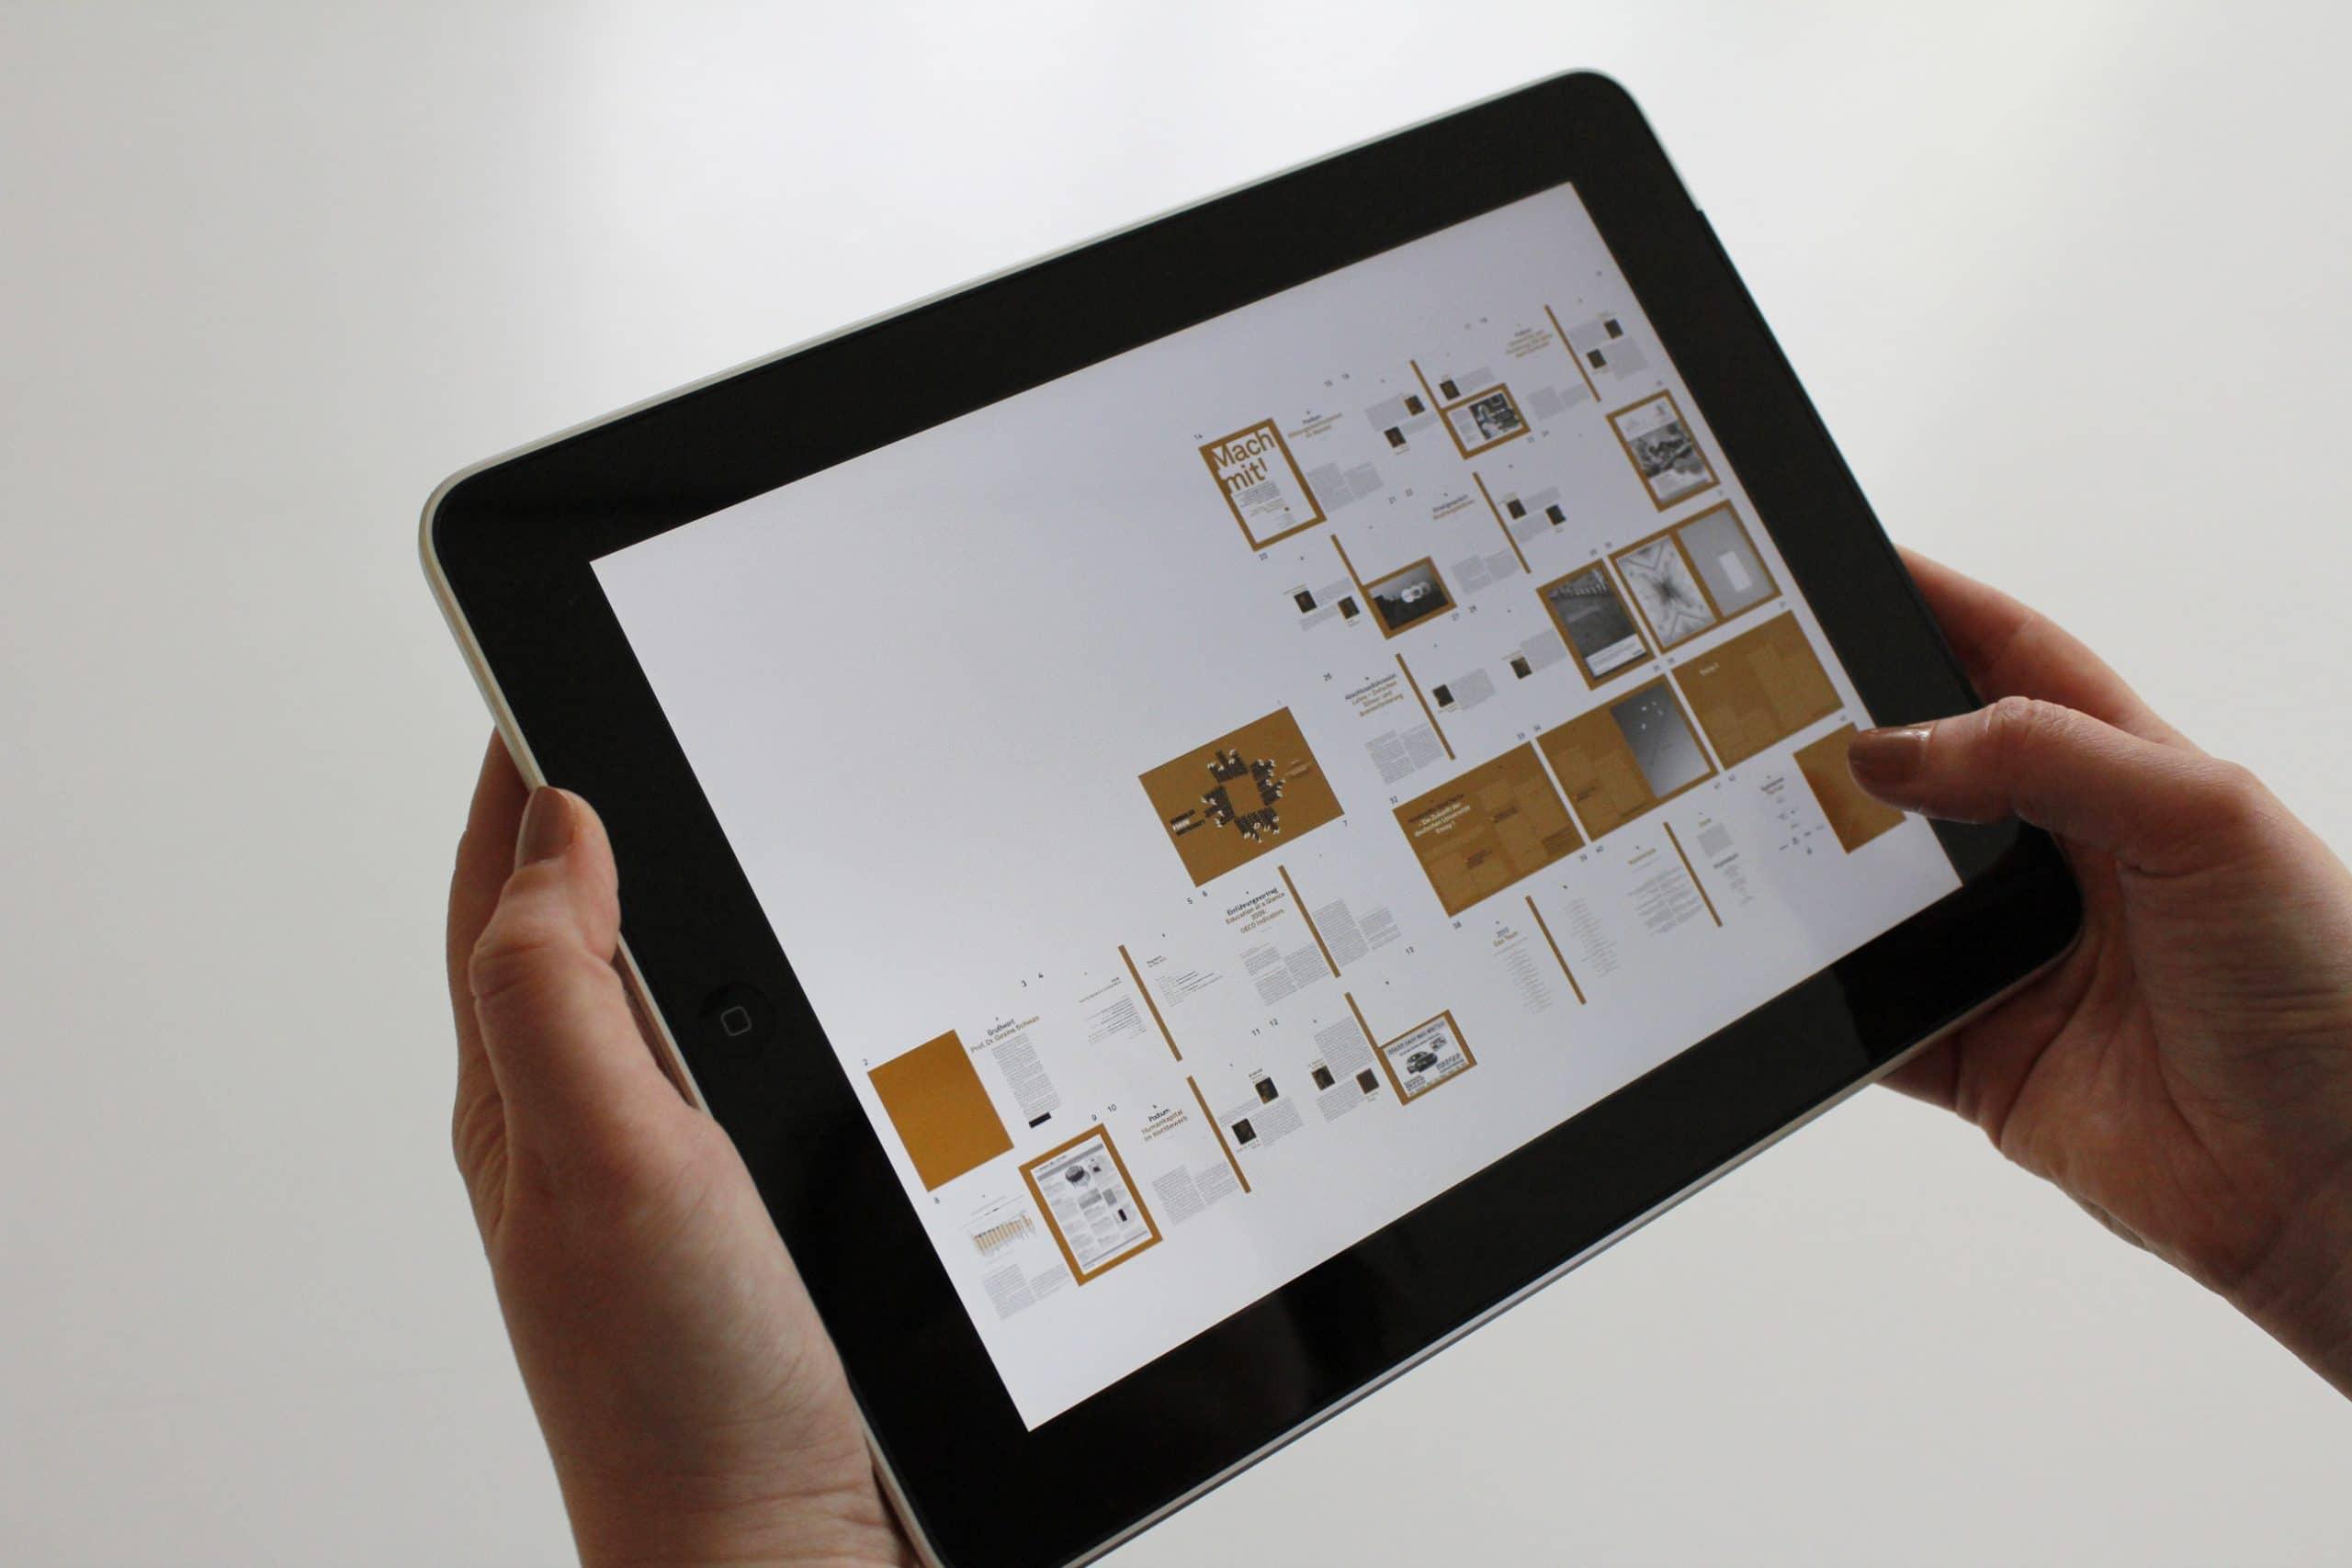 Tablet Mittelstand 4.0